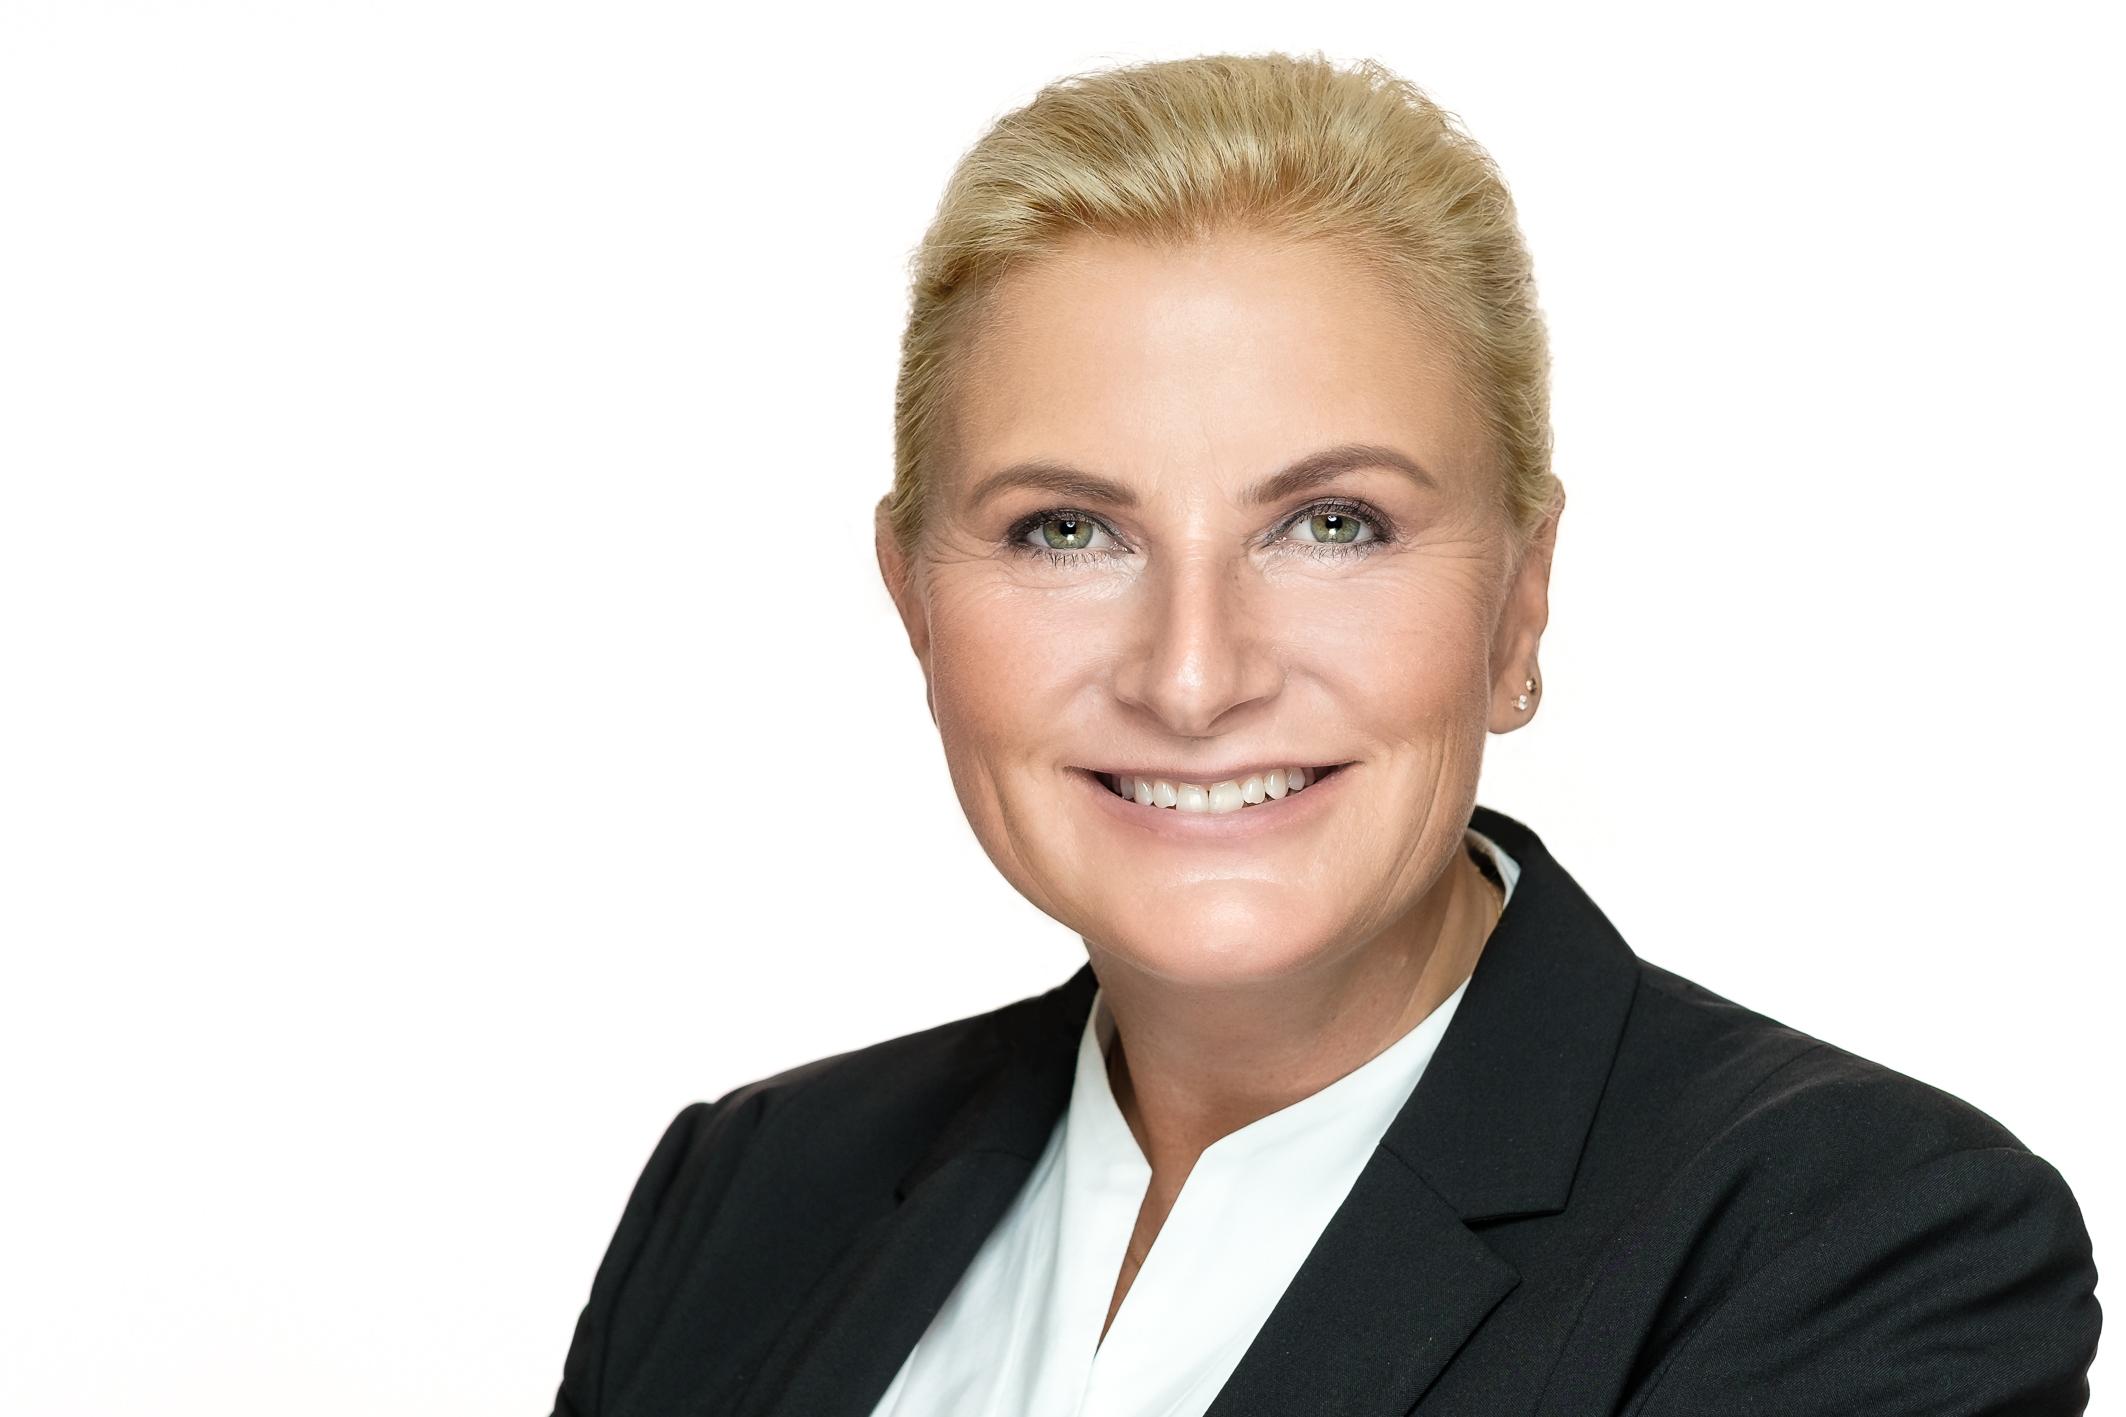 Anita-Gluszak-Haefs